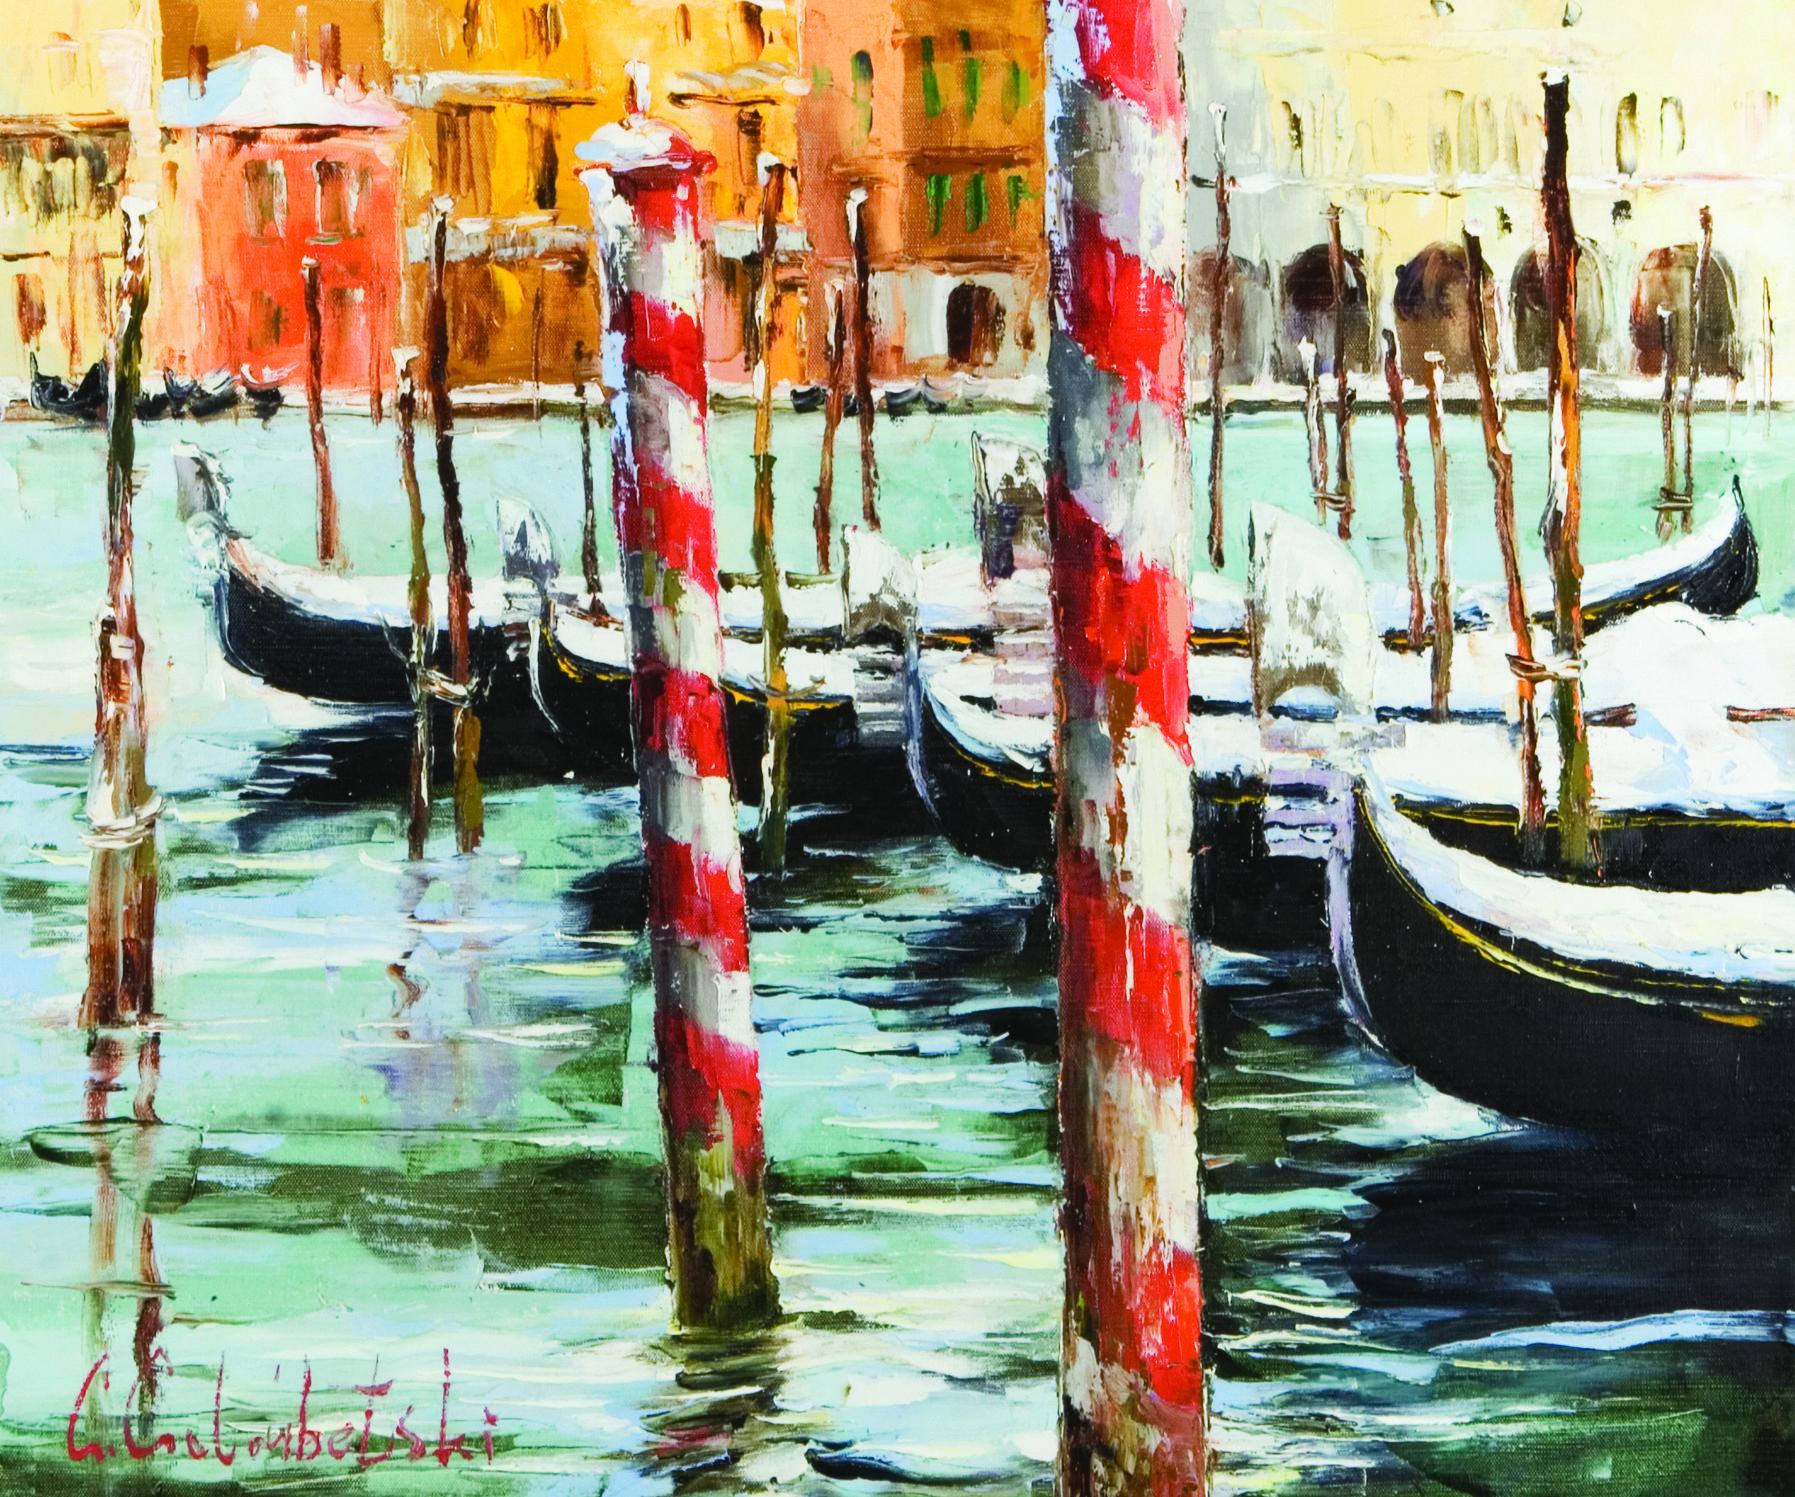 'Canal Grand in Winter' by Gleb Goloubetski, Oil on Canvas 50cmx60cm